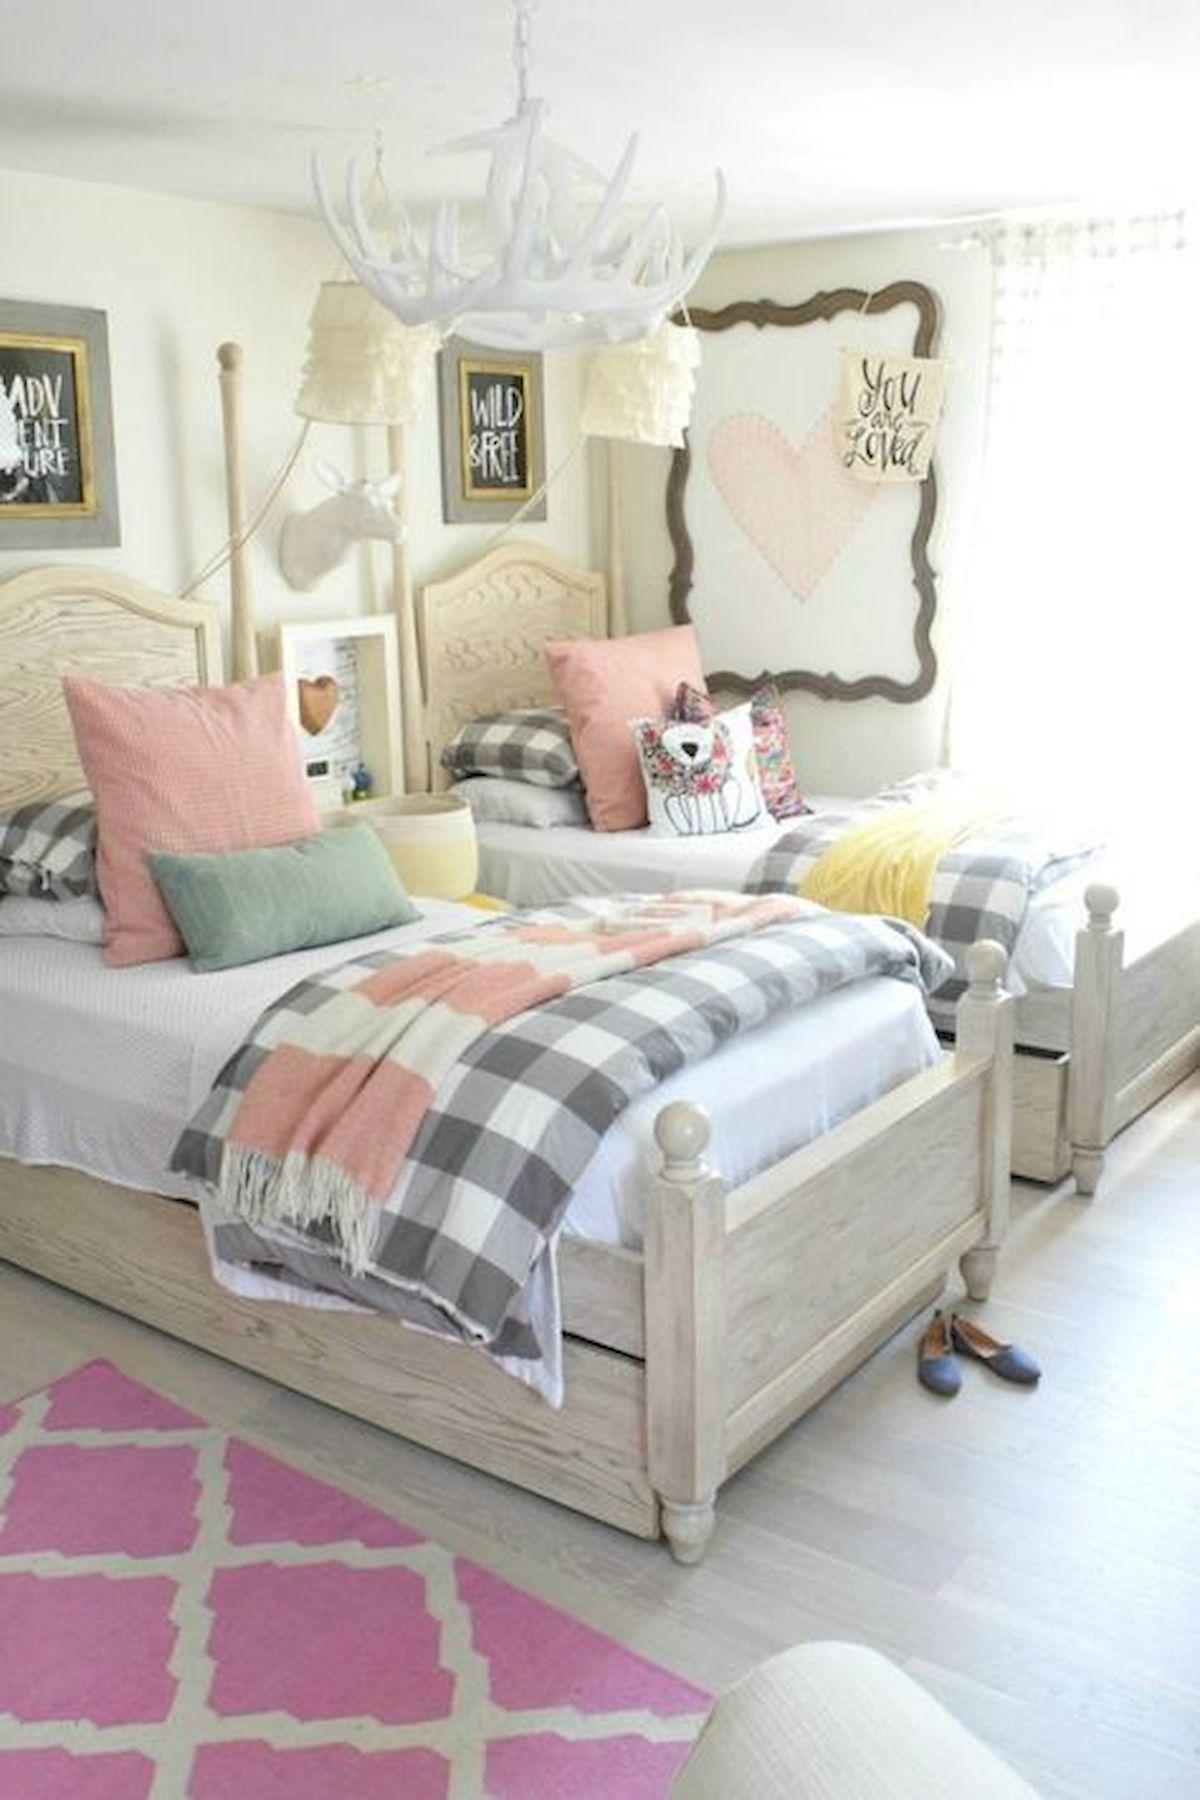 37 Simple Summer Bedroom Decor Ideas (9)